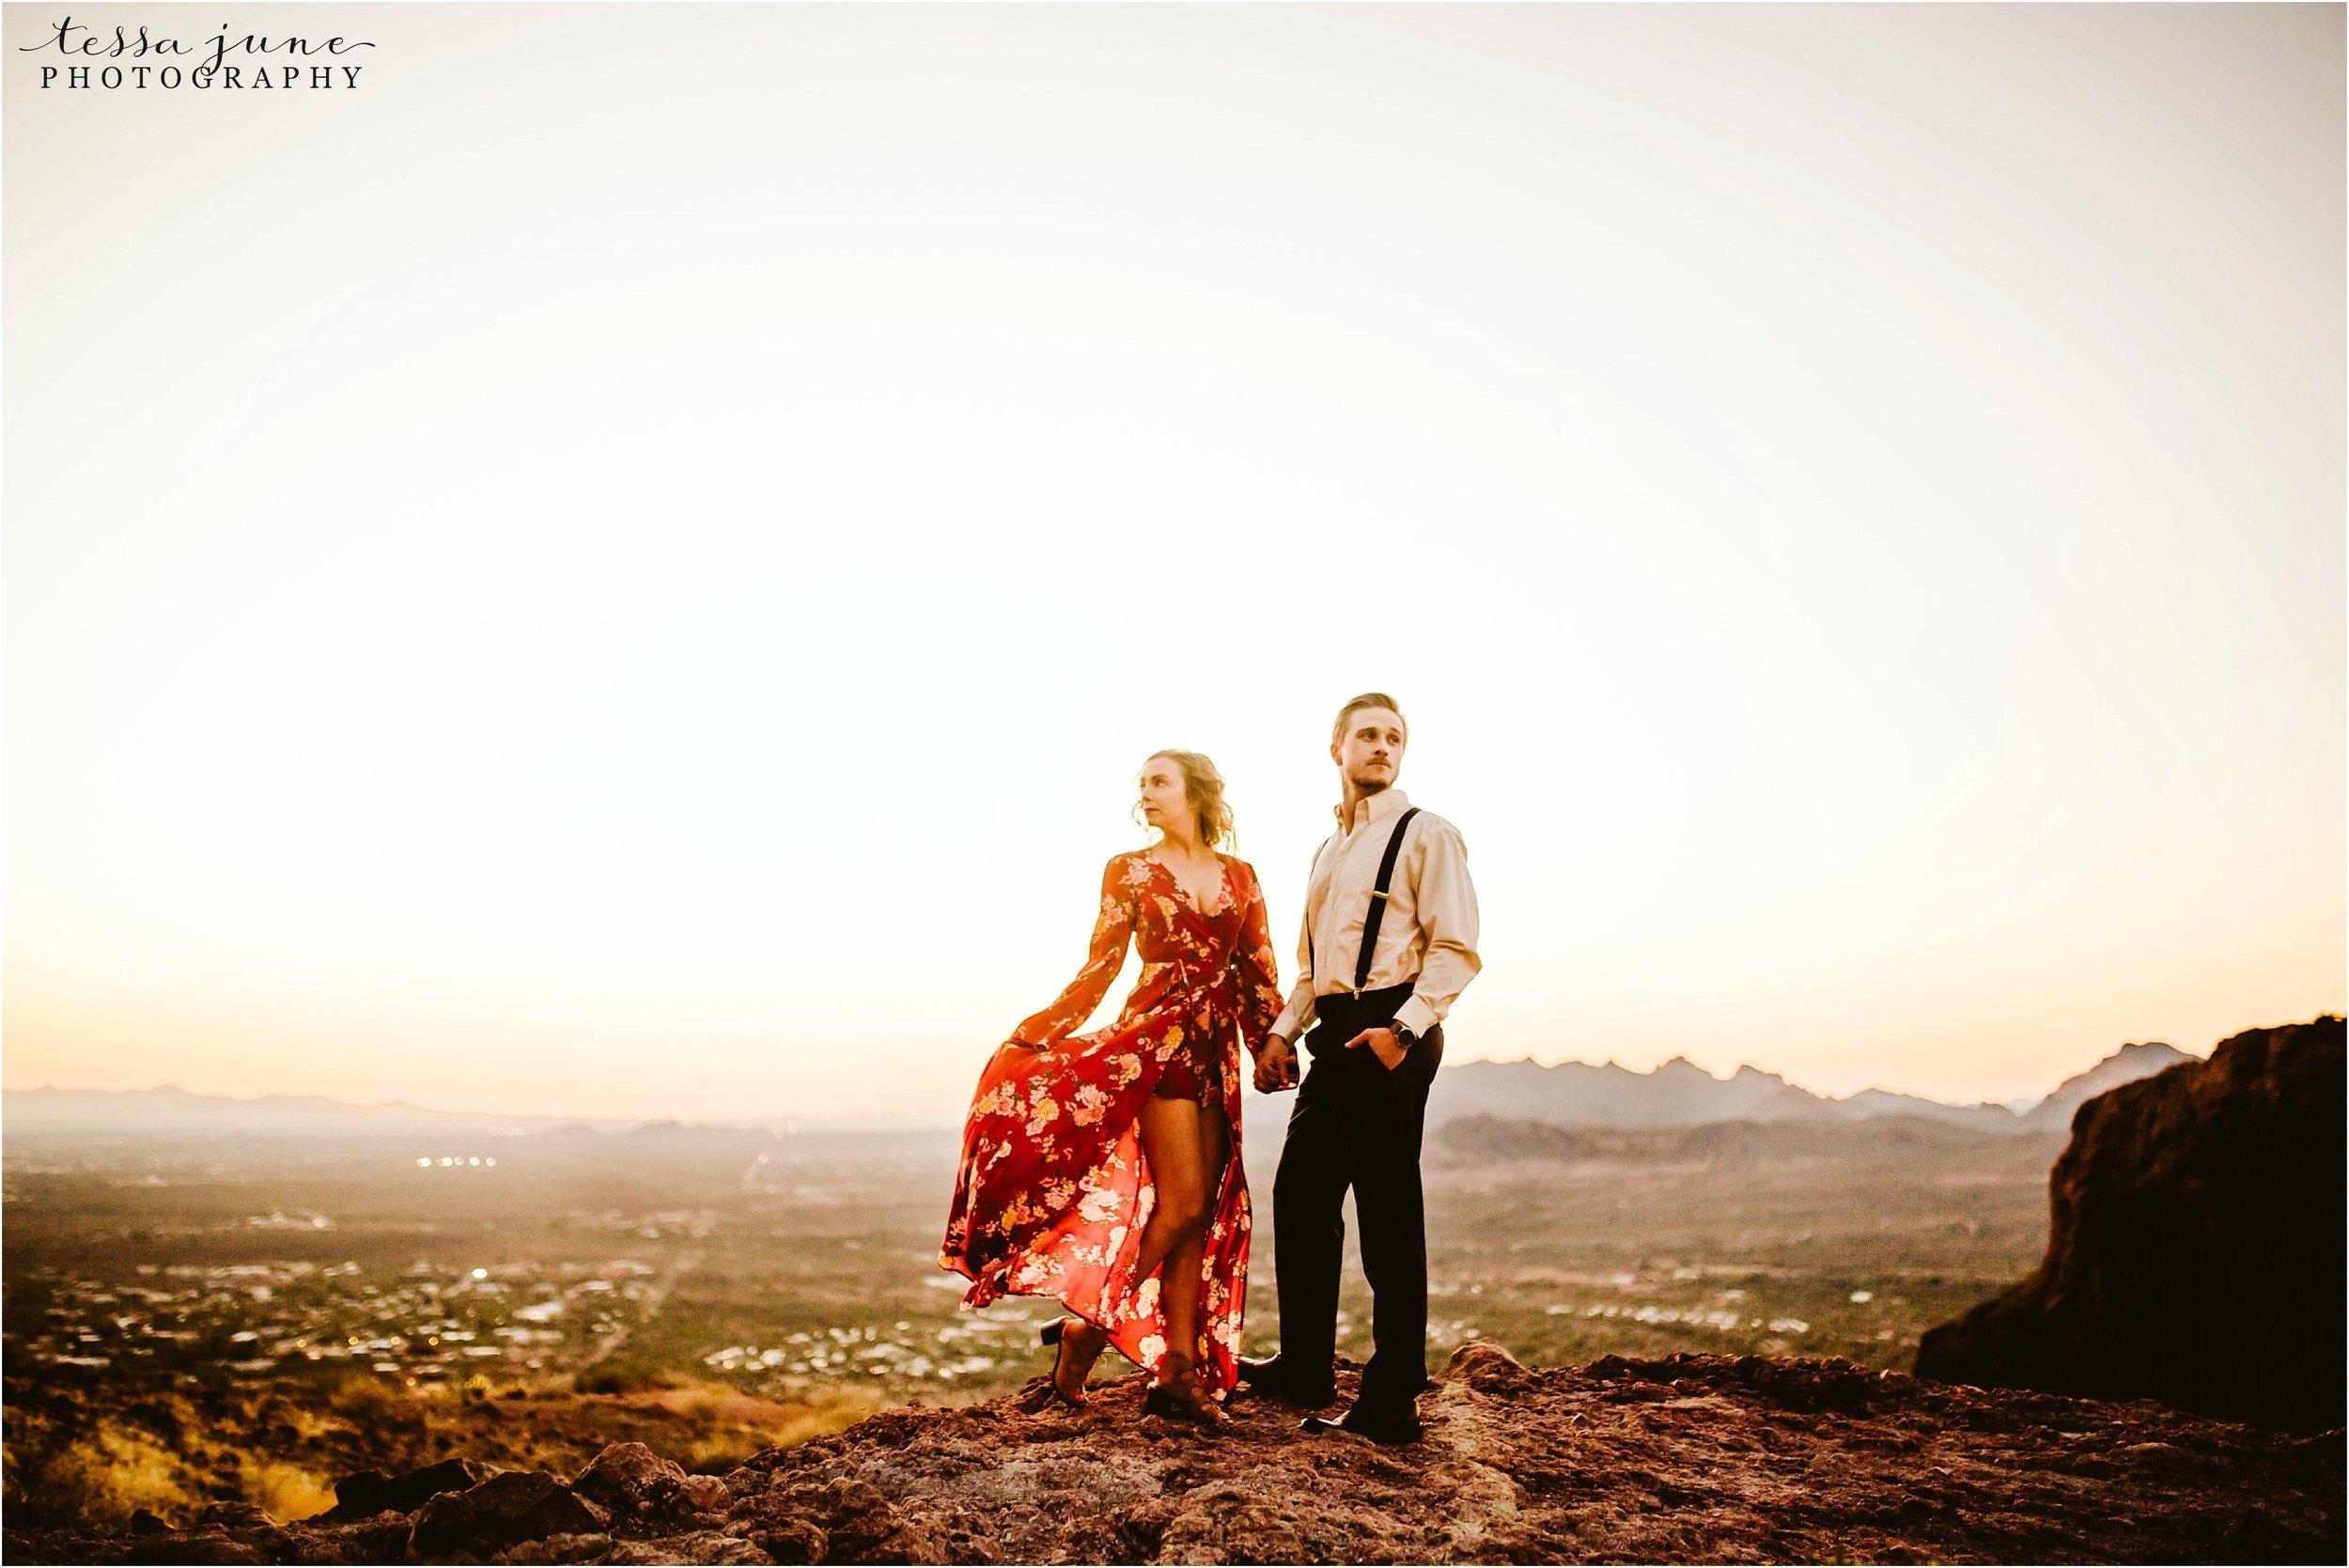 lost-dutchman-state-park-engagement-arizona-destination-photographer-phoenix-20.jpg